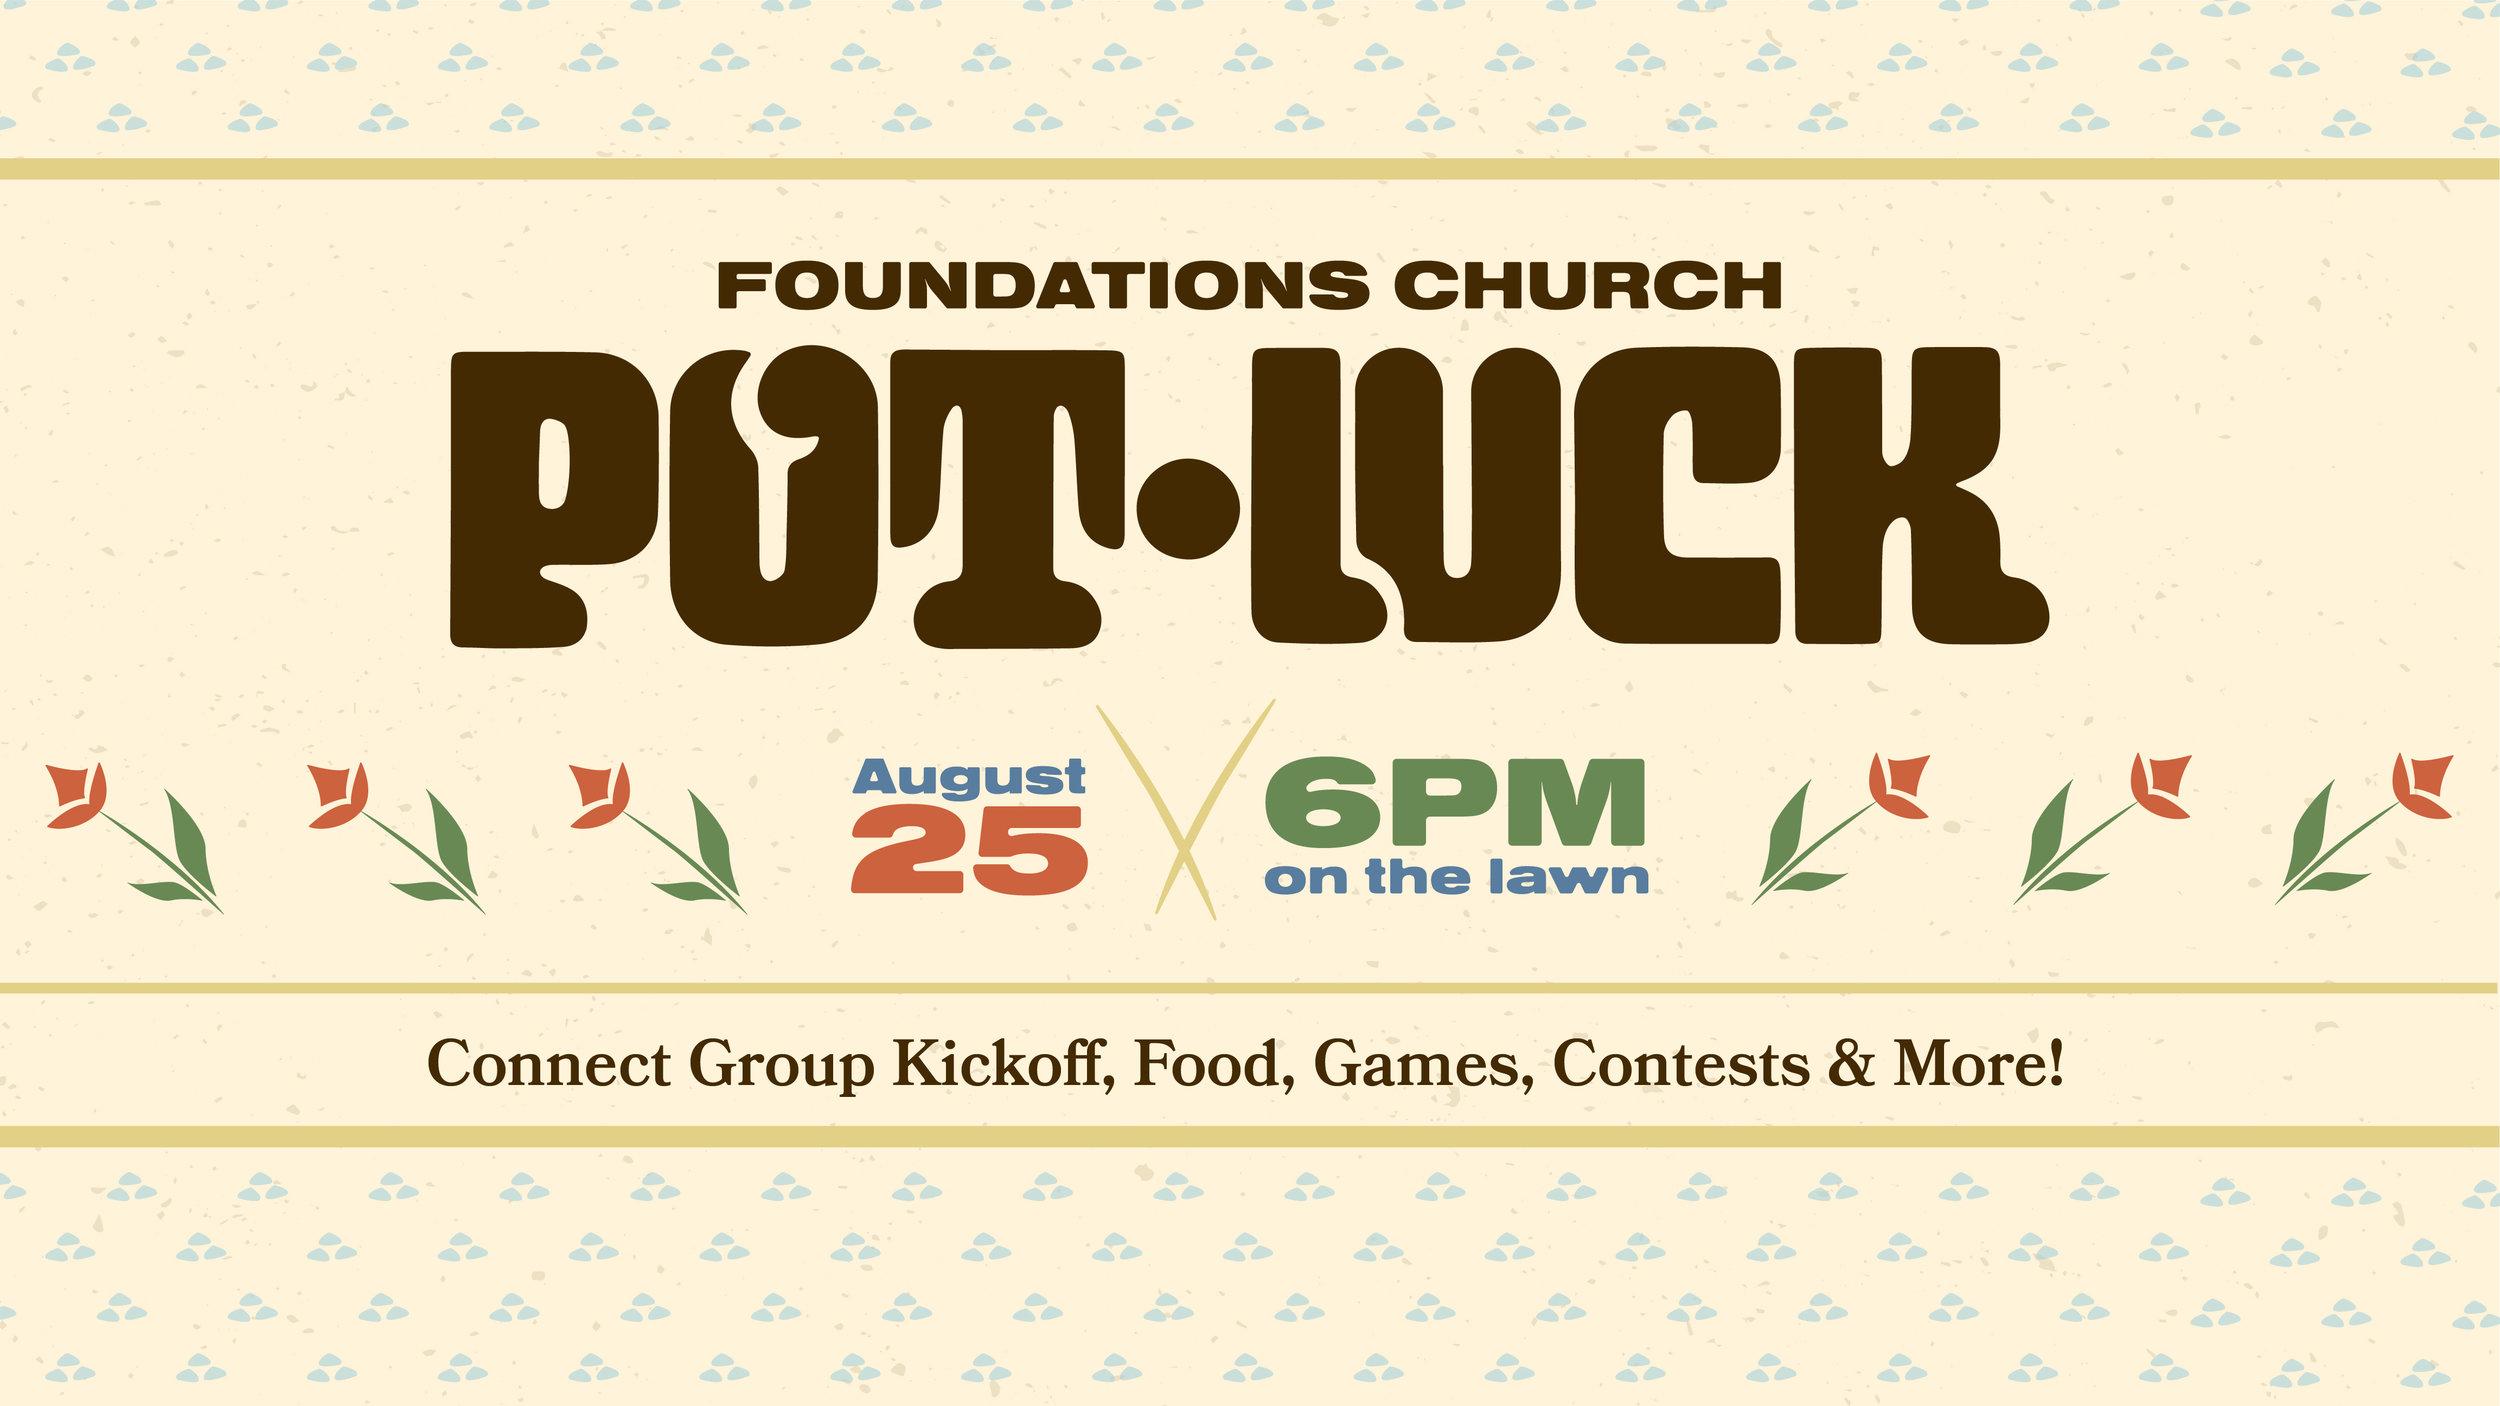 Foundations Church Potluck.jpg